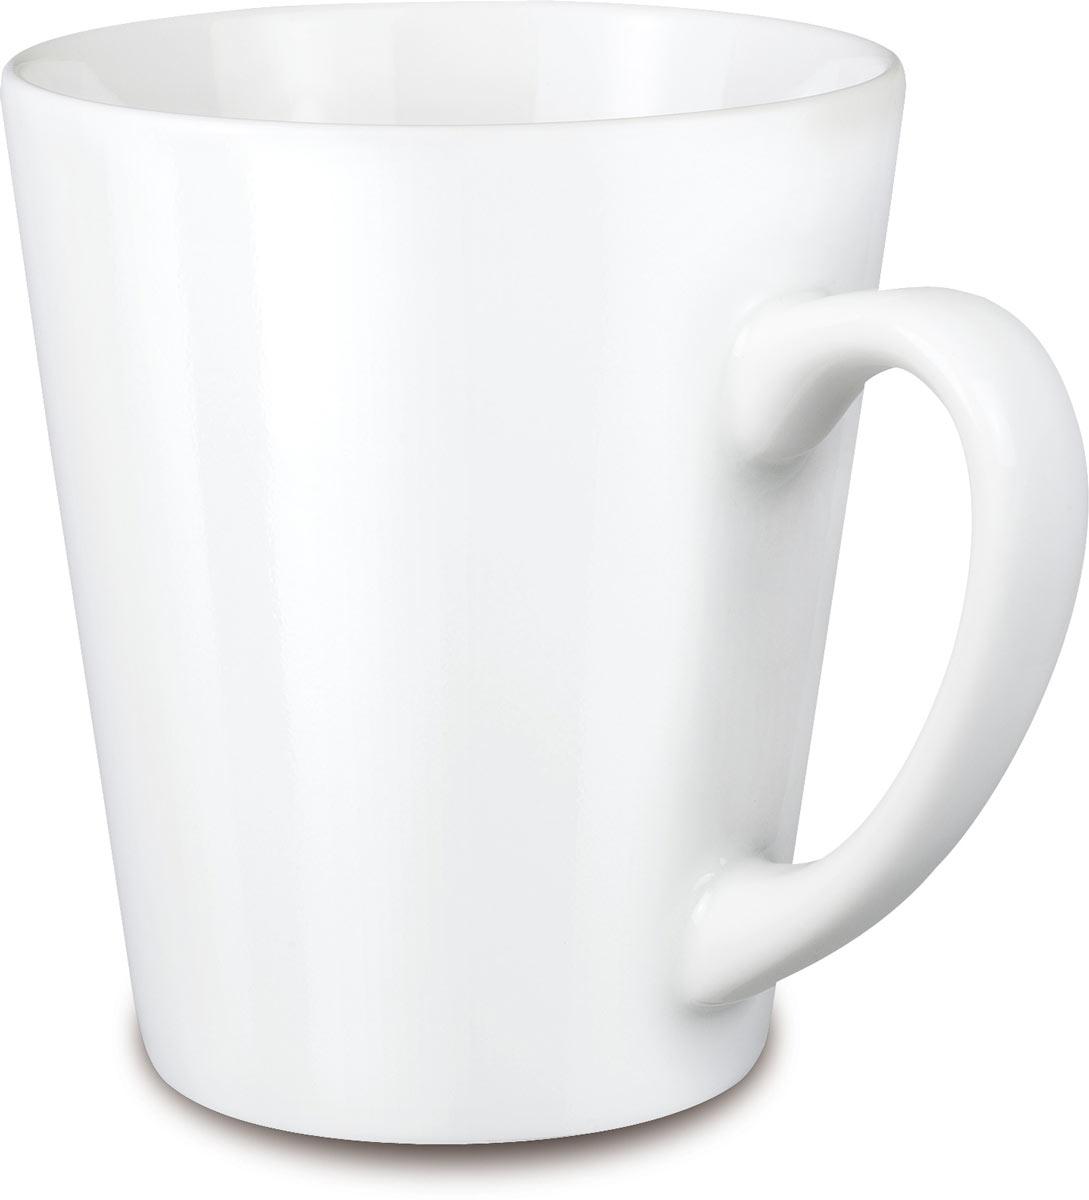 mug originale mug design mugs publicitaires objets publicitaires objet publicitaire. Black Bedroom Furniture Sets. Home Design Ideas